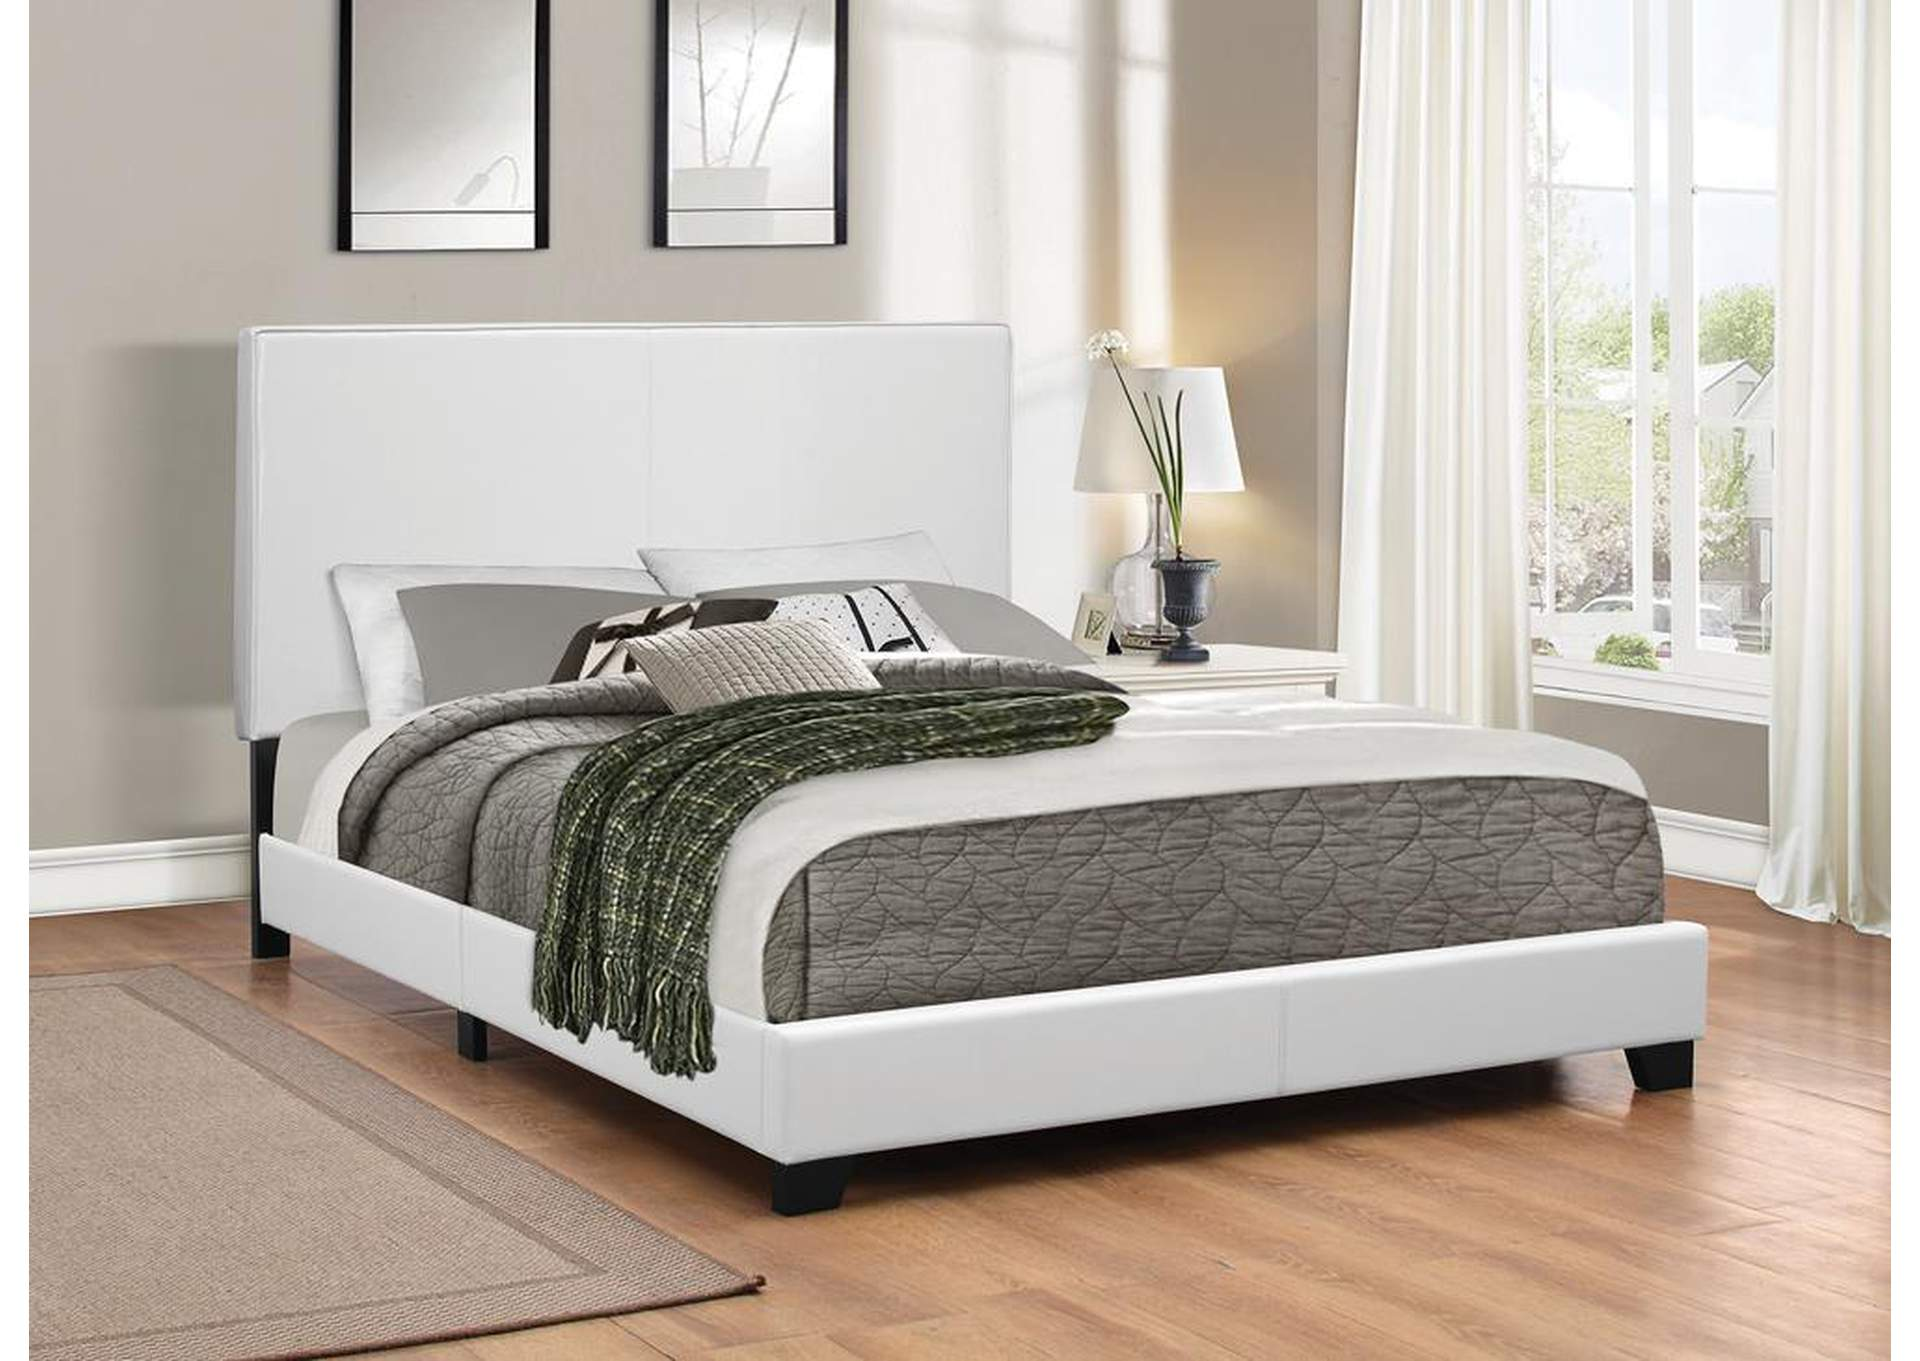 Big box furniture discount furniture stores in miami - White queen platform bedroom set ...